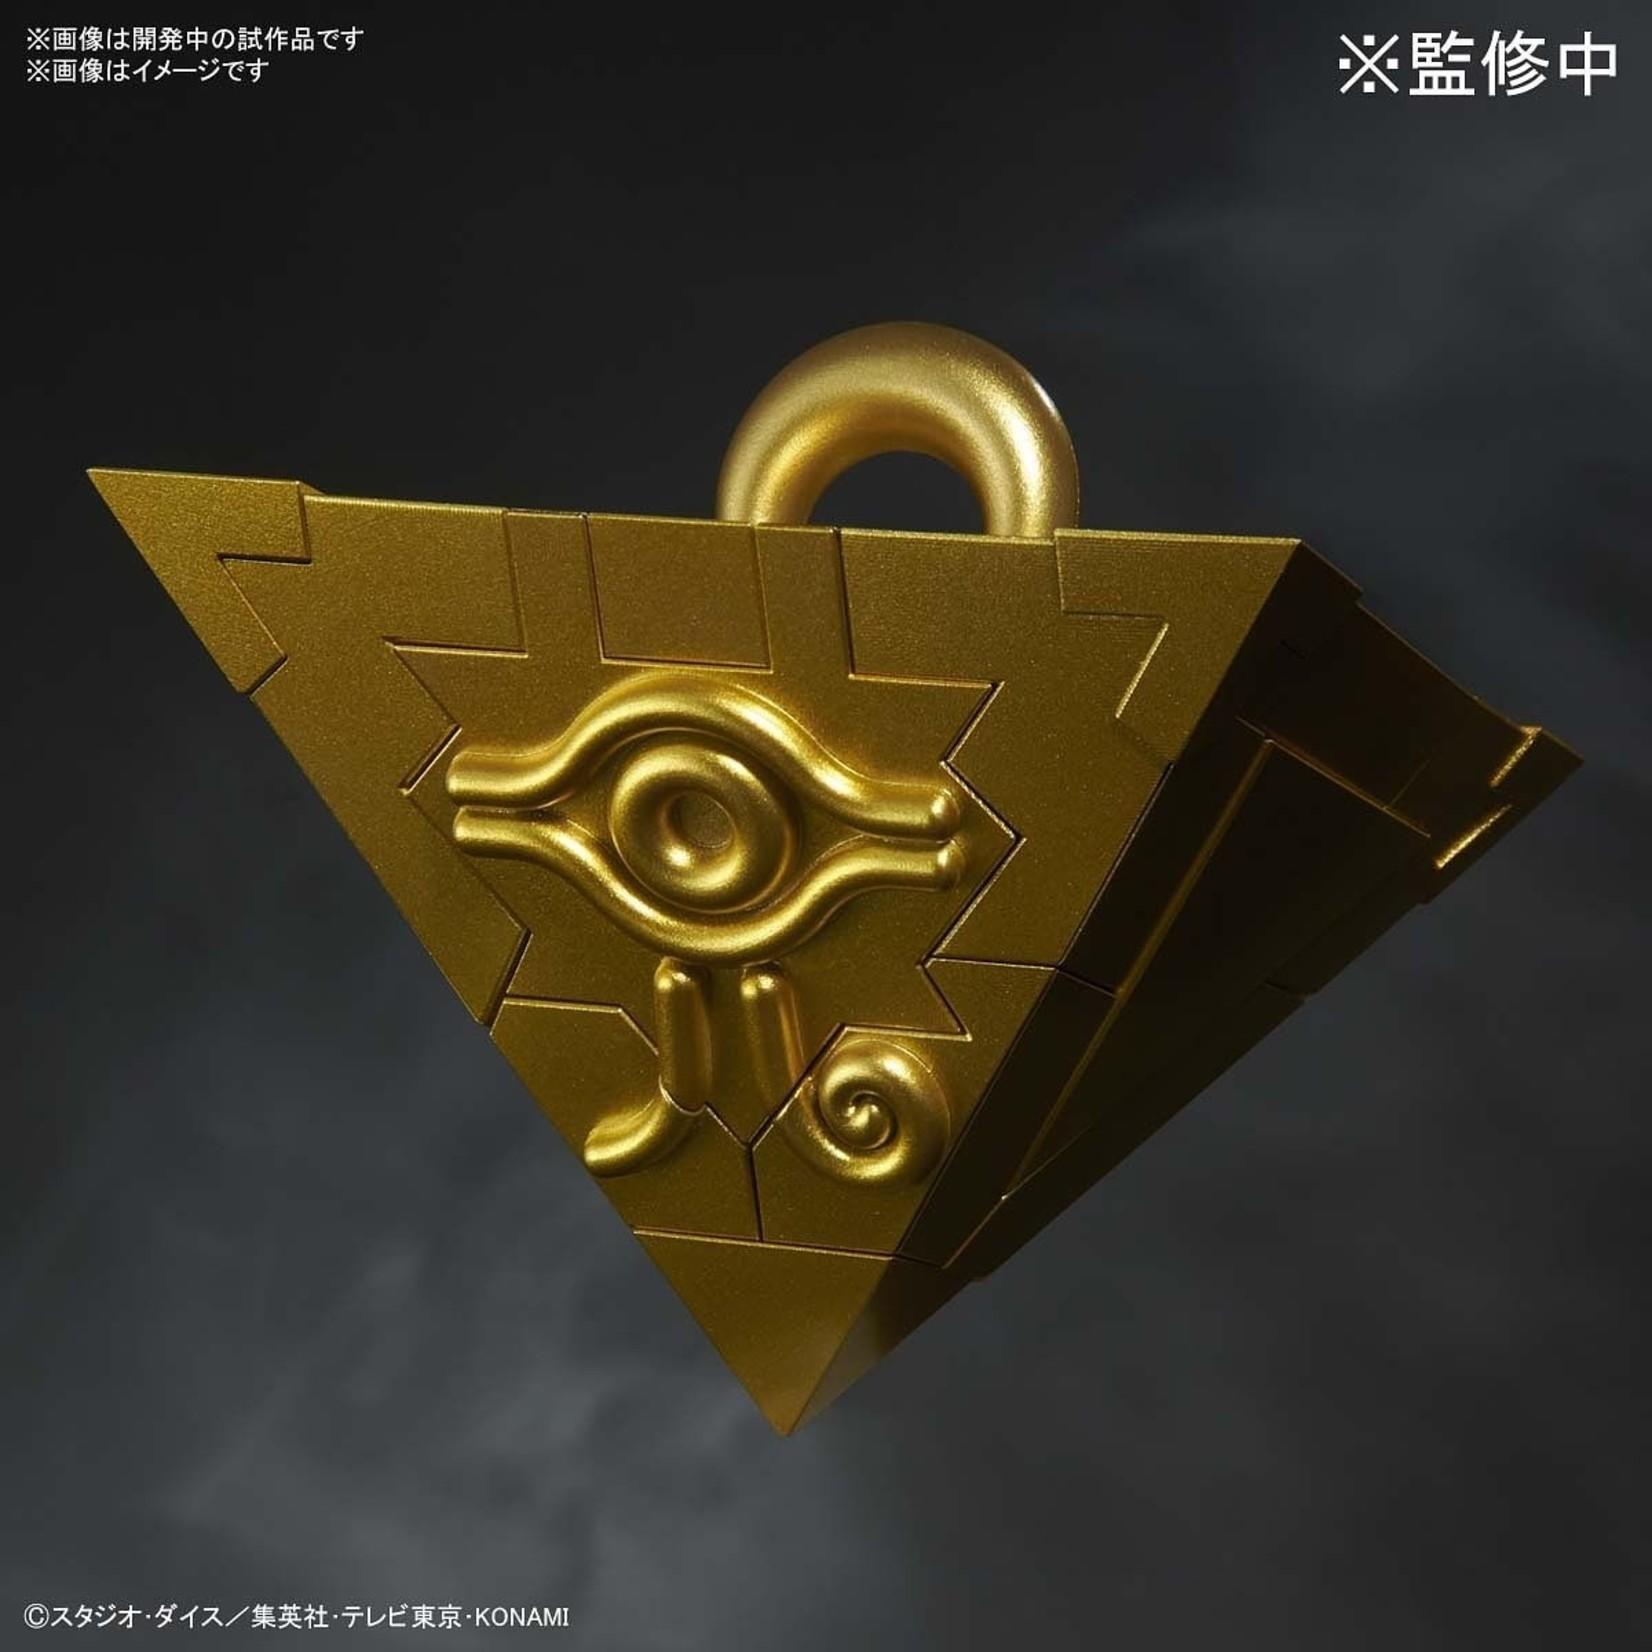 Bandai [Precommande] ULTIMAGEAR Yu-Gi-Oh - Millennium Puzzle model kit